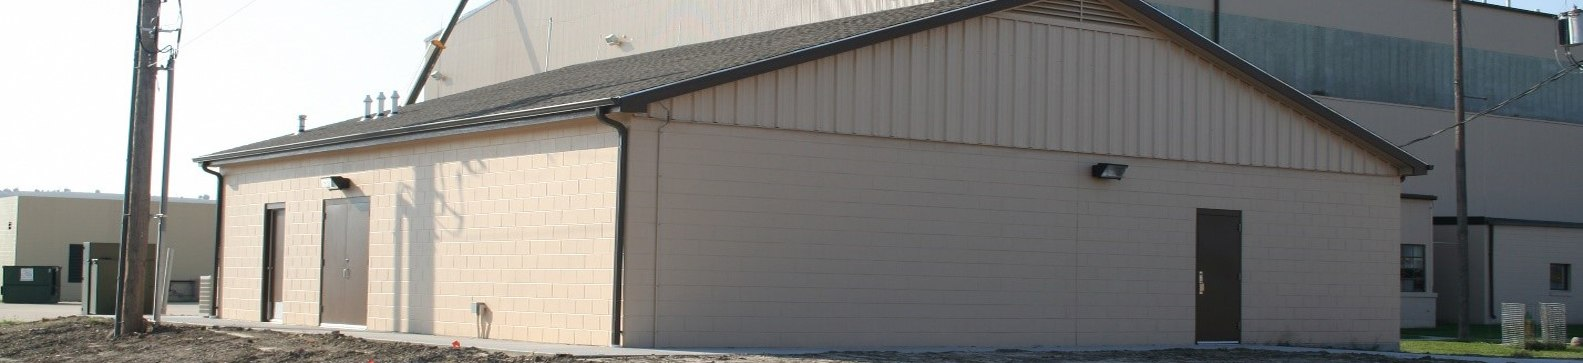 Fort Riley Radar Building